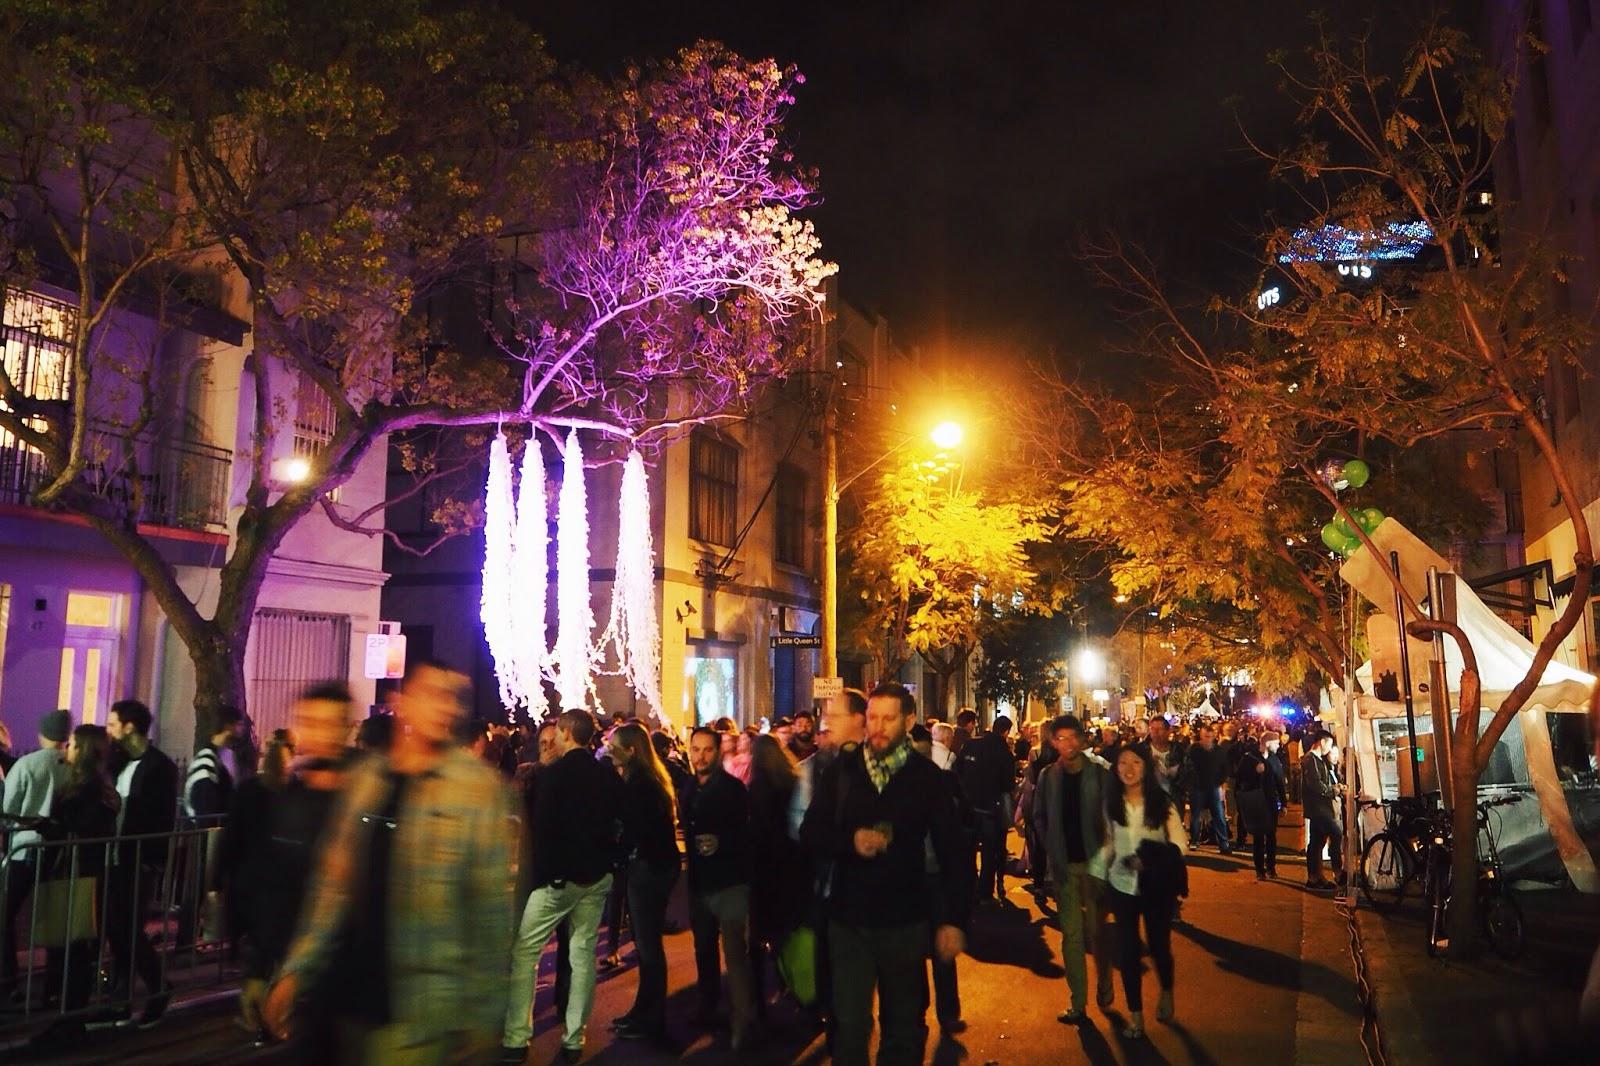 elashock, blog, blogger, fashion, out and about, places, sydney, chippendale, beams, beams arts festival, beams festival, central park, エラショック, ファッション, ブログ, ブロガー, シドニー, オーストラリア, チッペンデール, ビームズアートフェスティバル